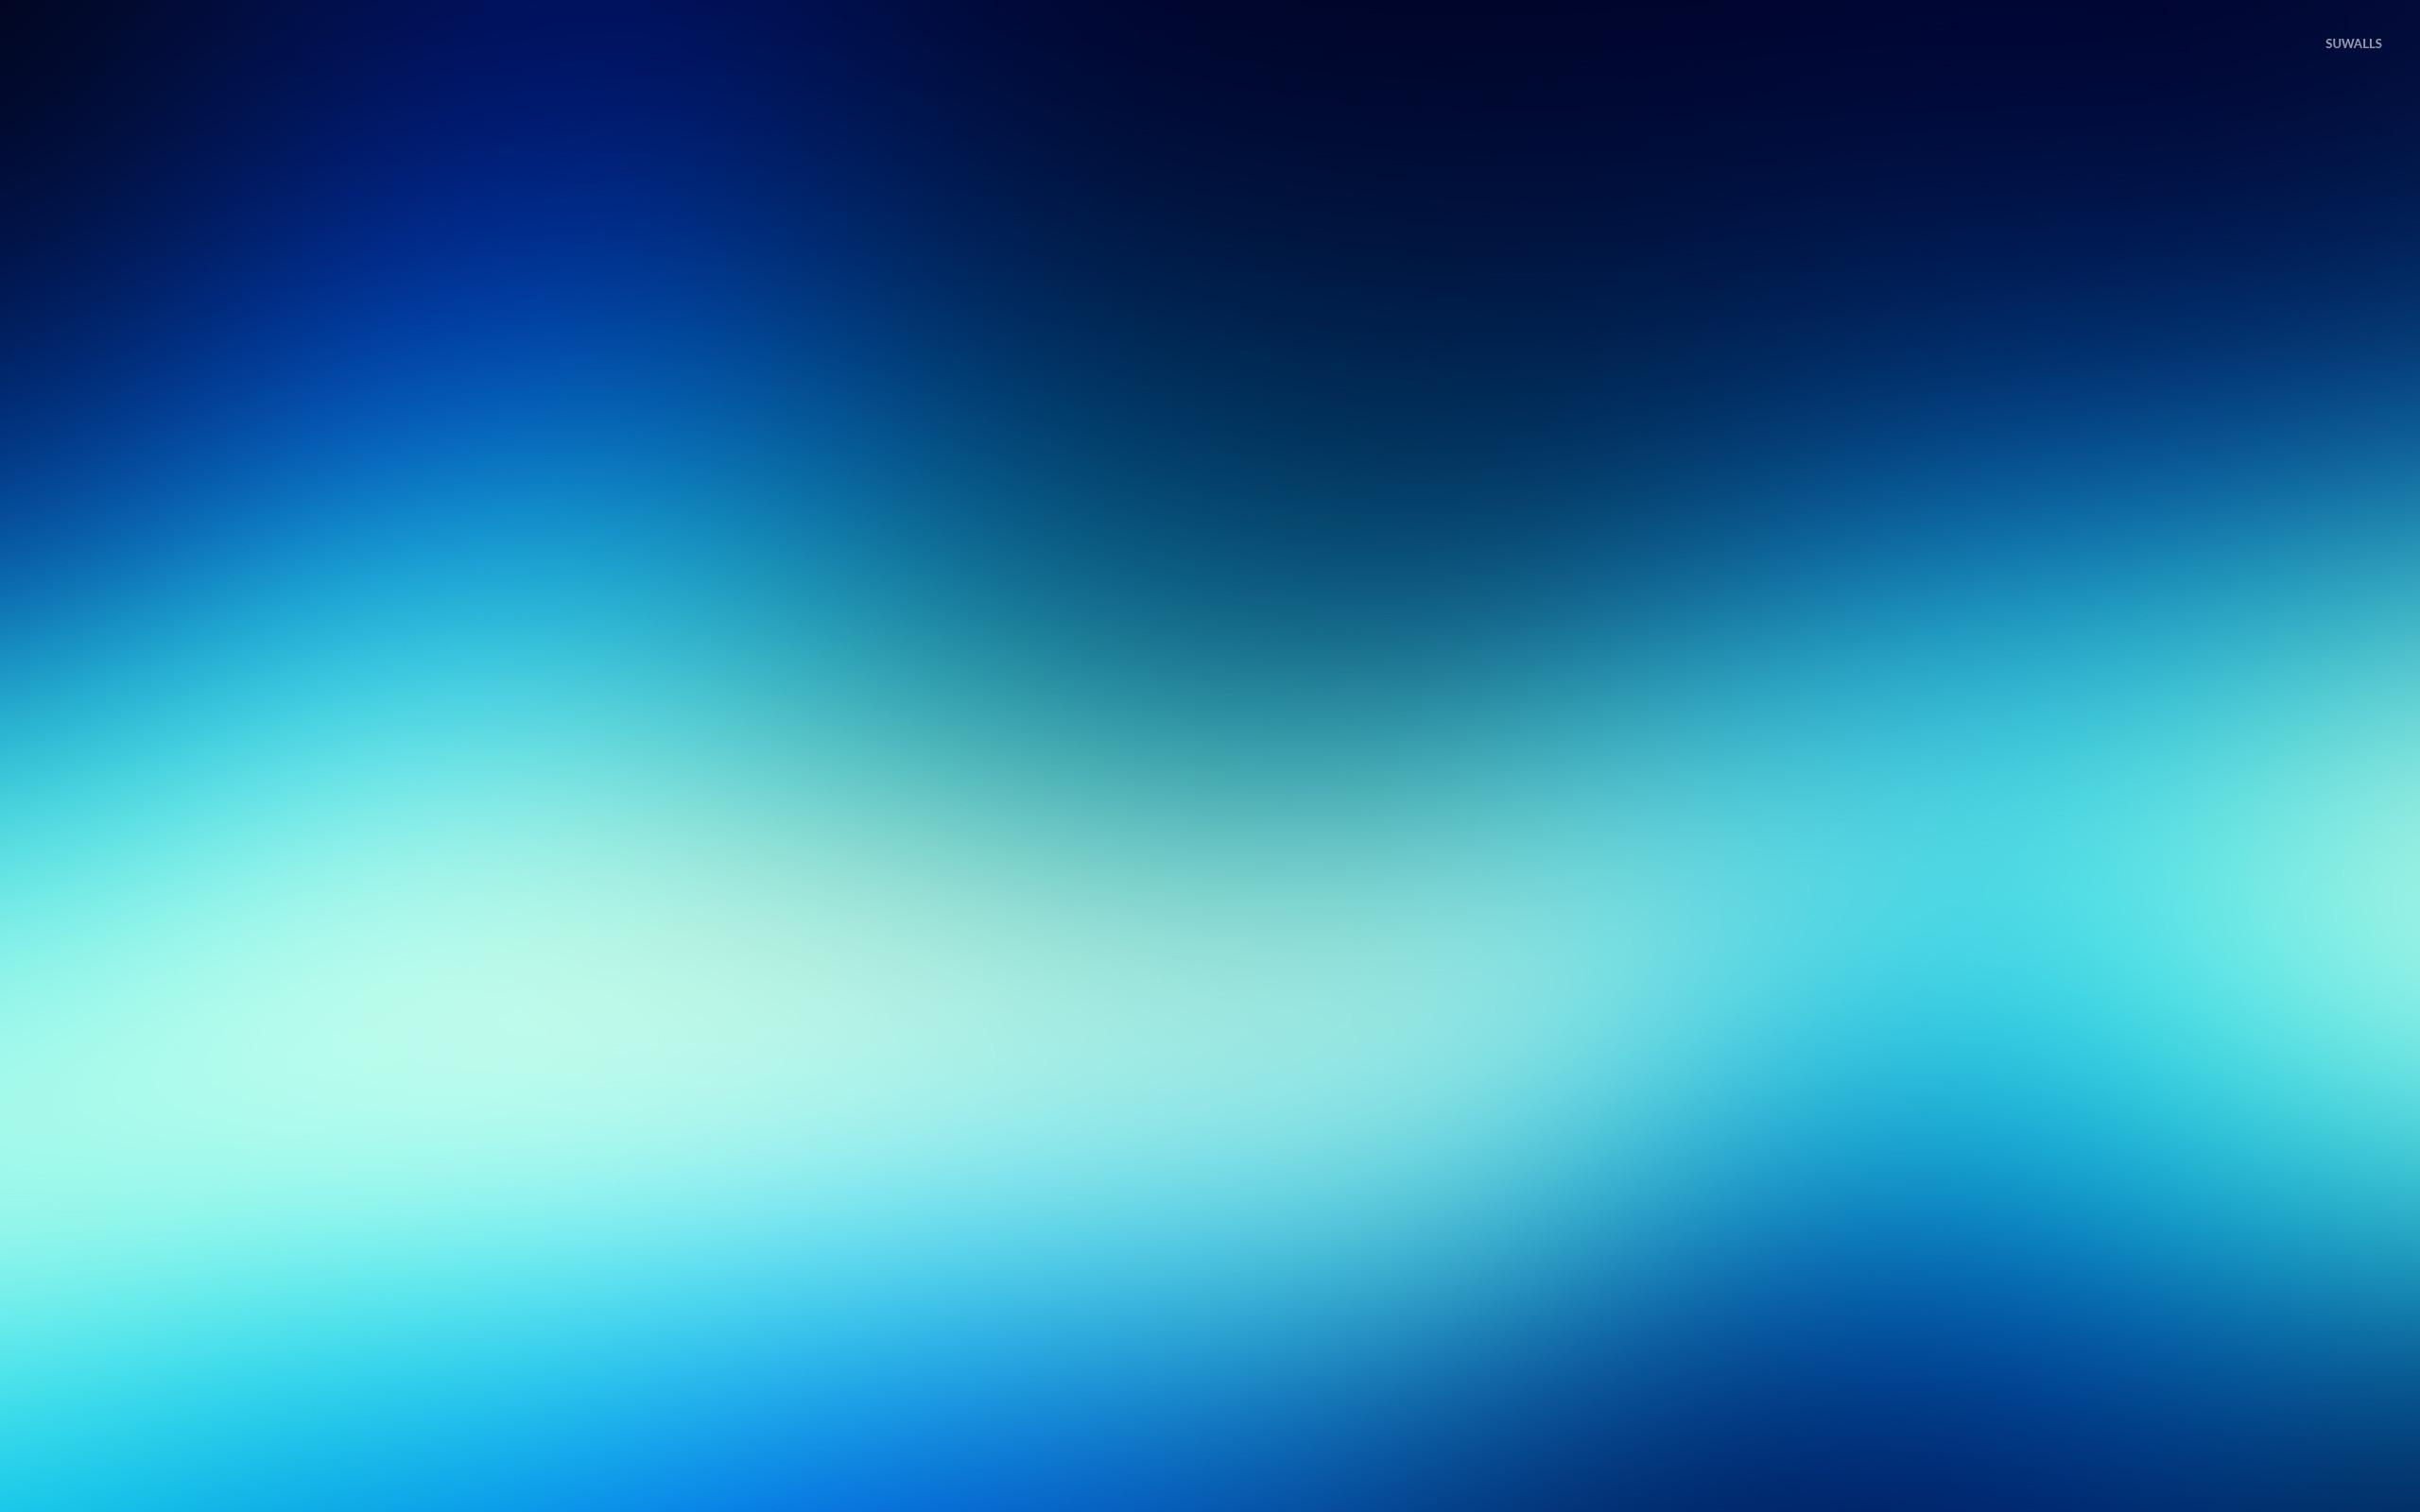 Blue Bright Blur Wallpaper